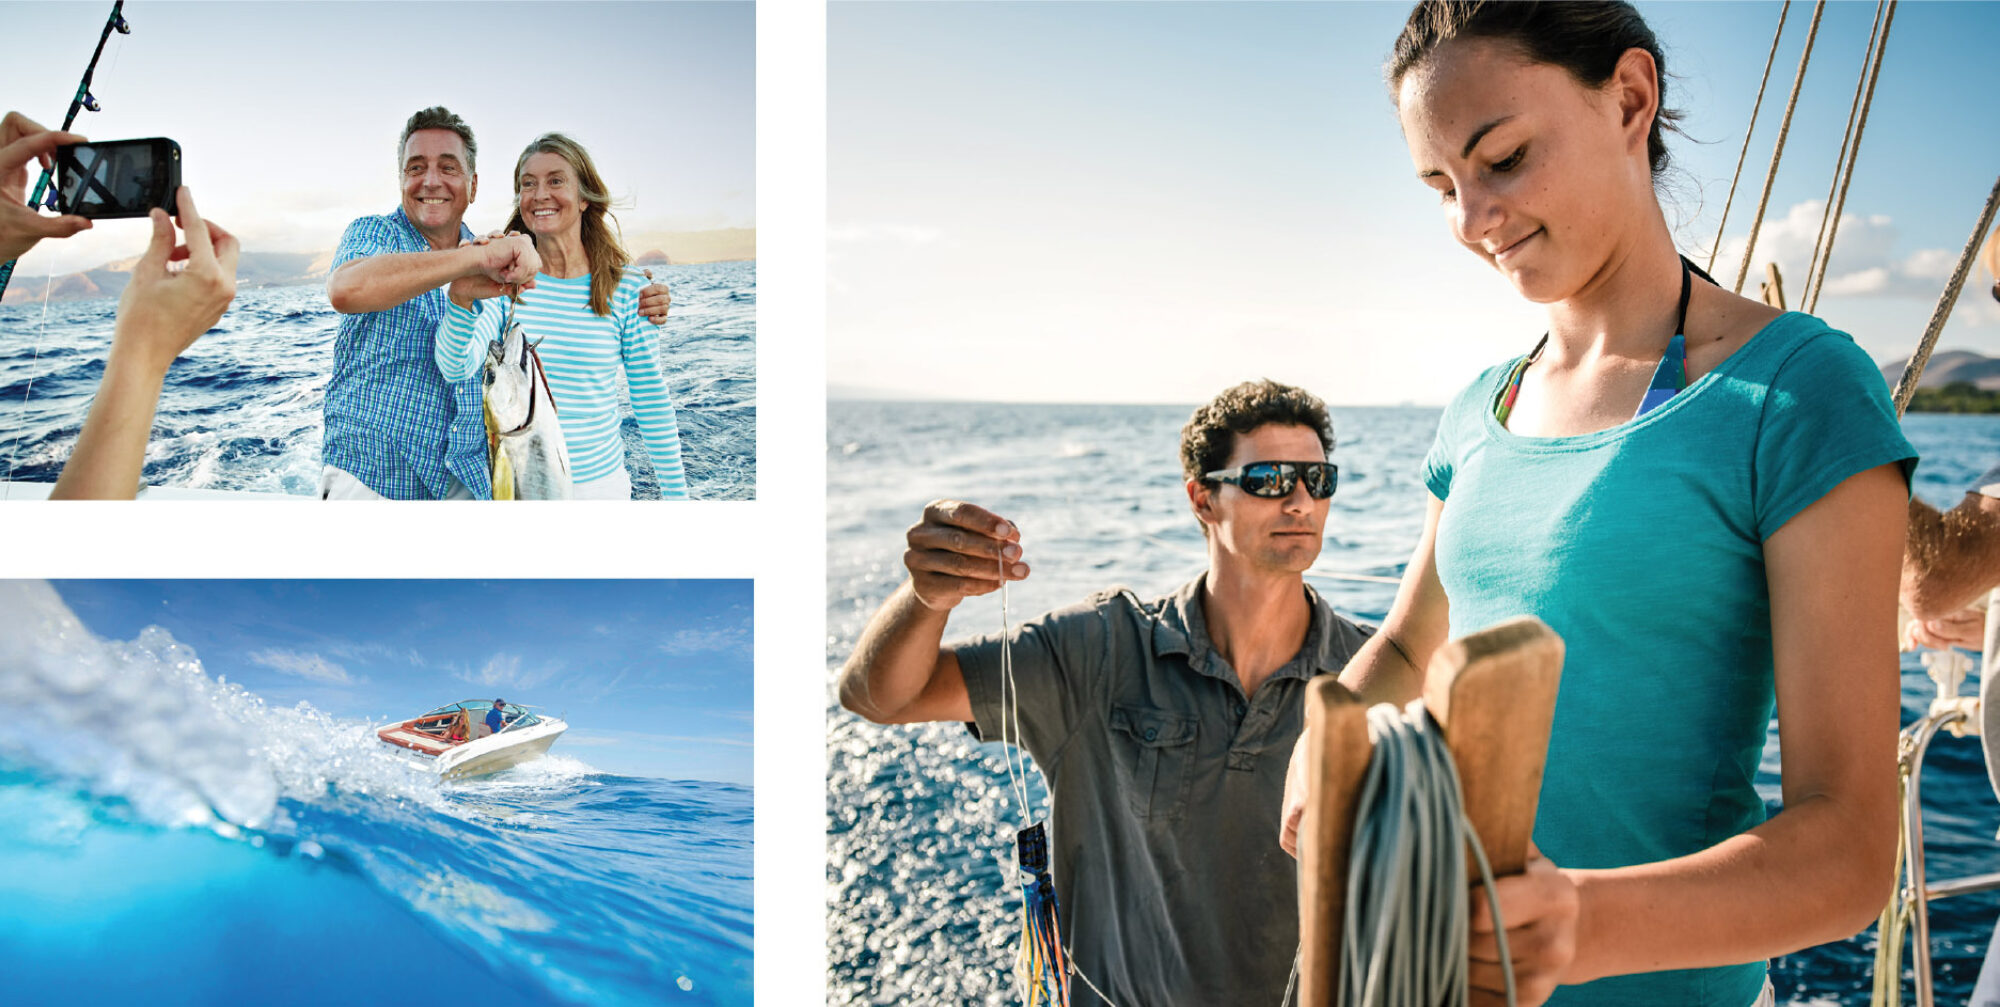 Club Marine brand photography